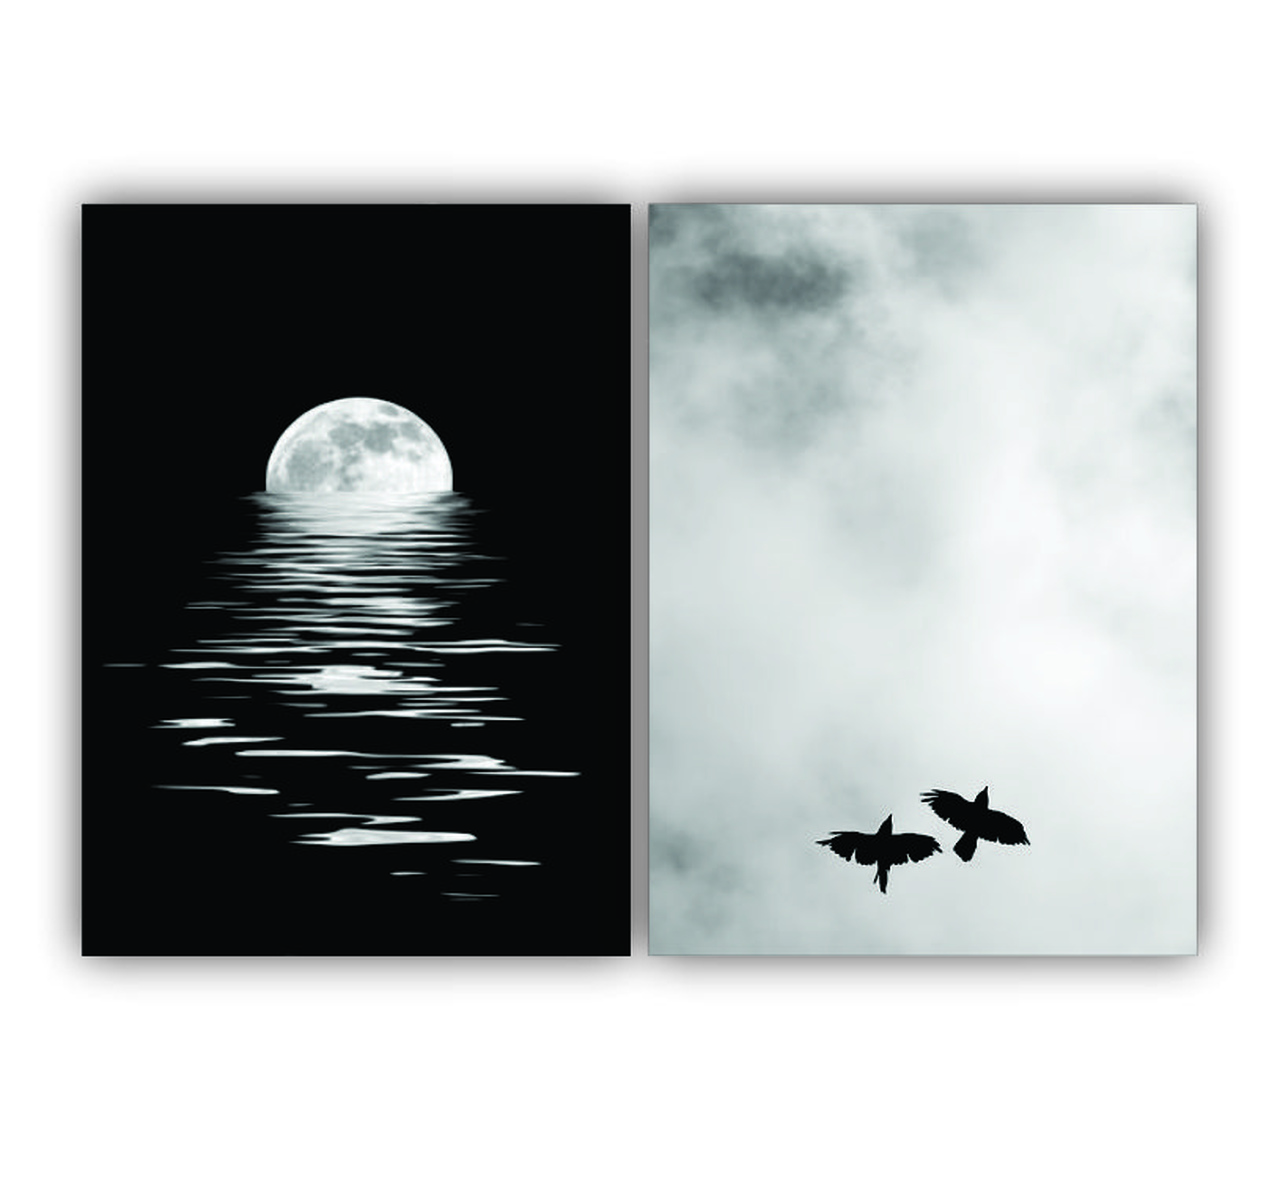 Quadro  Noite de Luar Pássaros -  Kit 2 telas